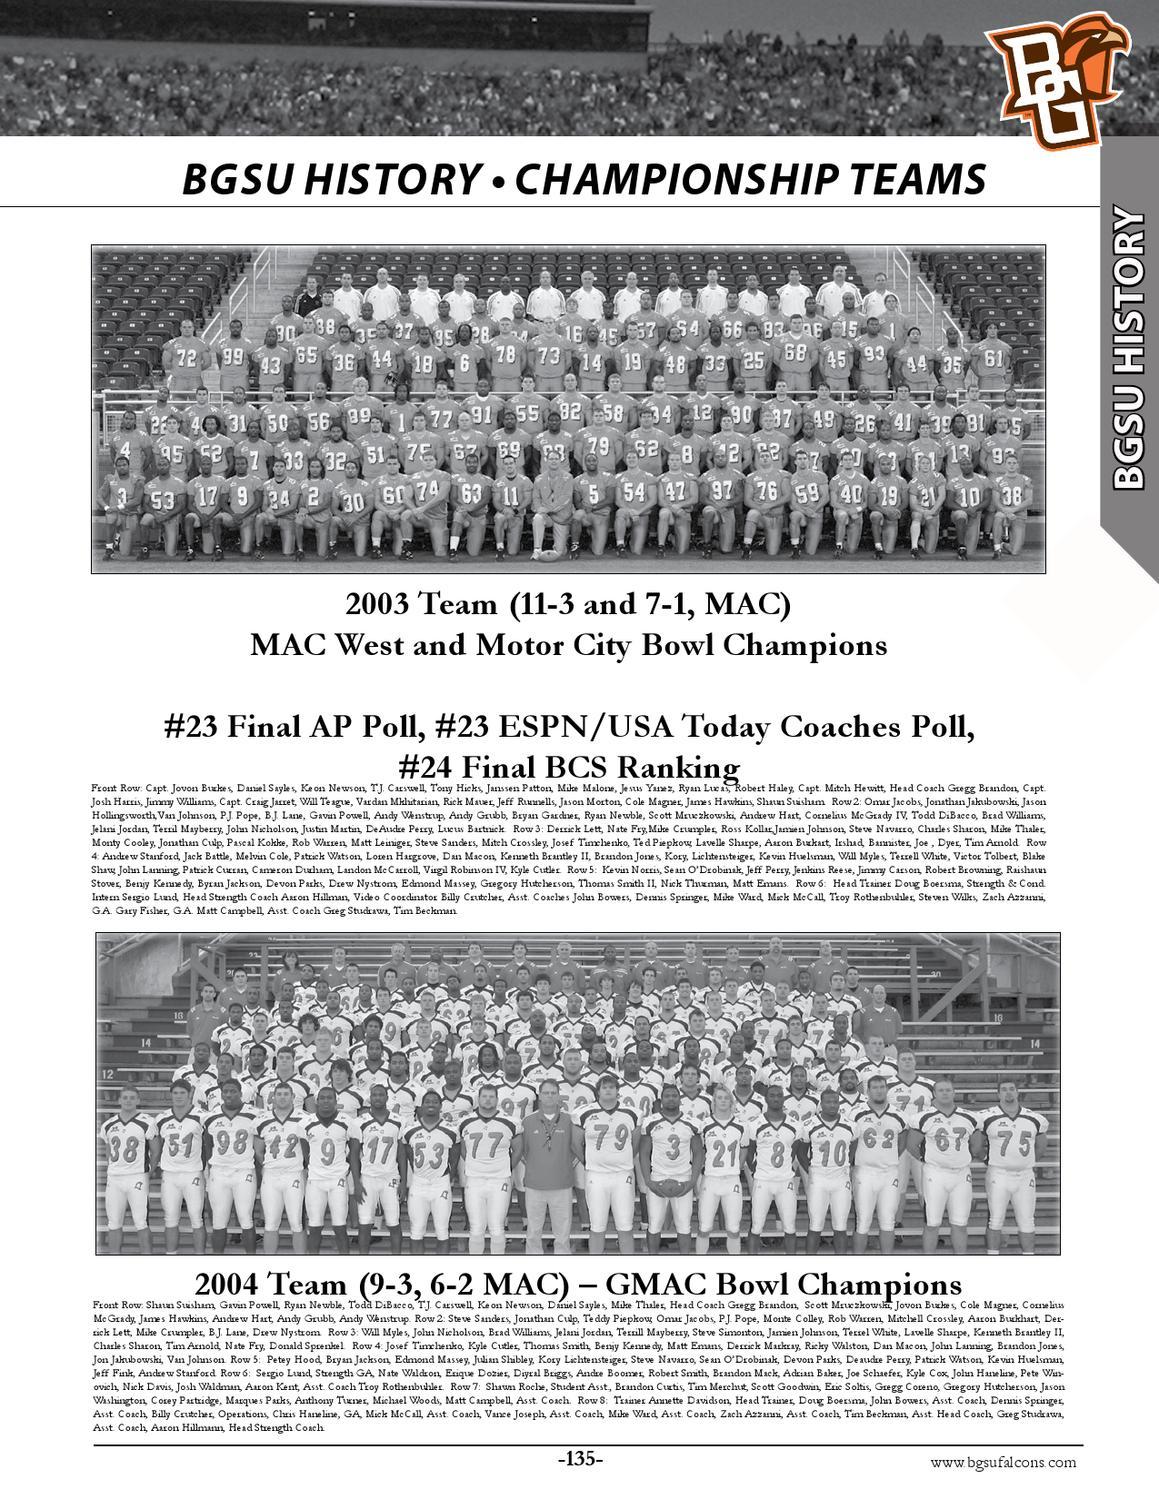 2012 BGSU Football Media Guide by Jason Knavel - issuu